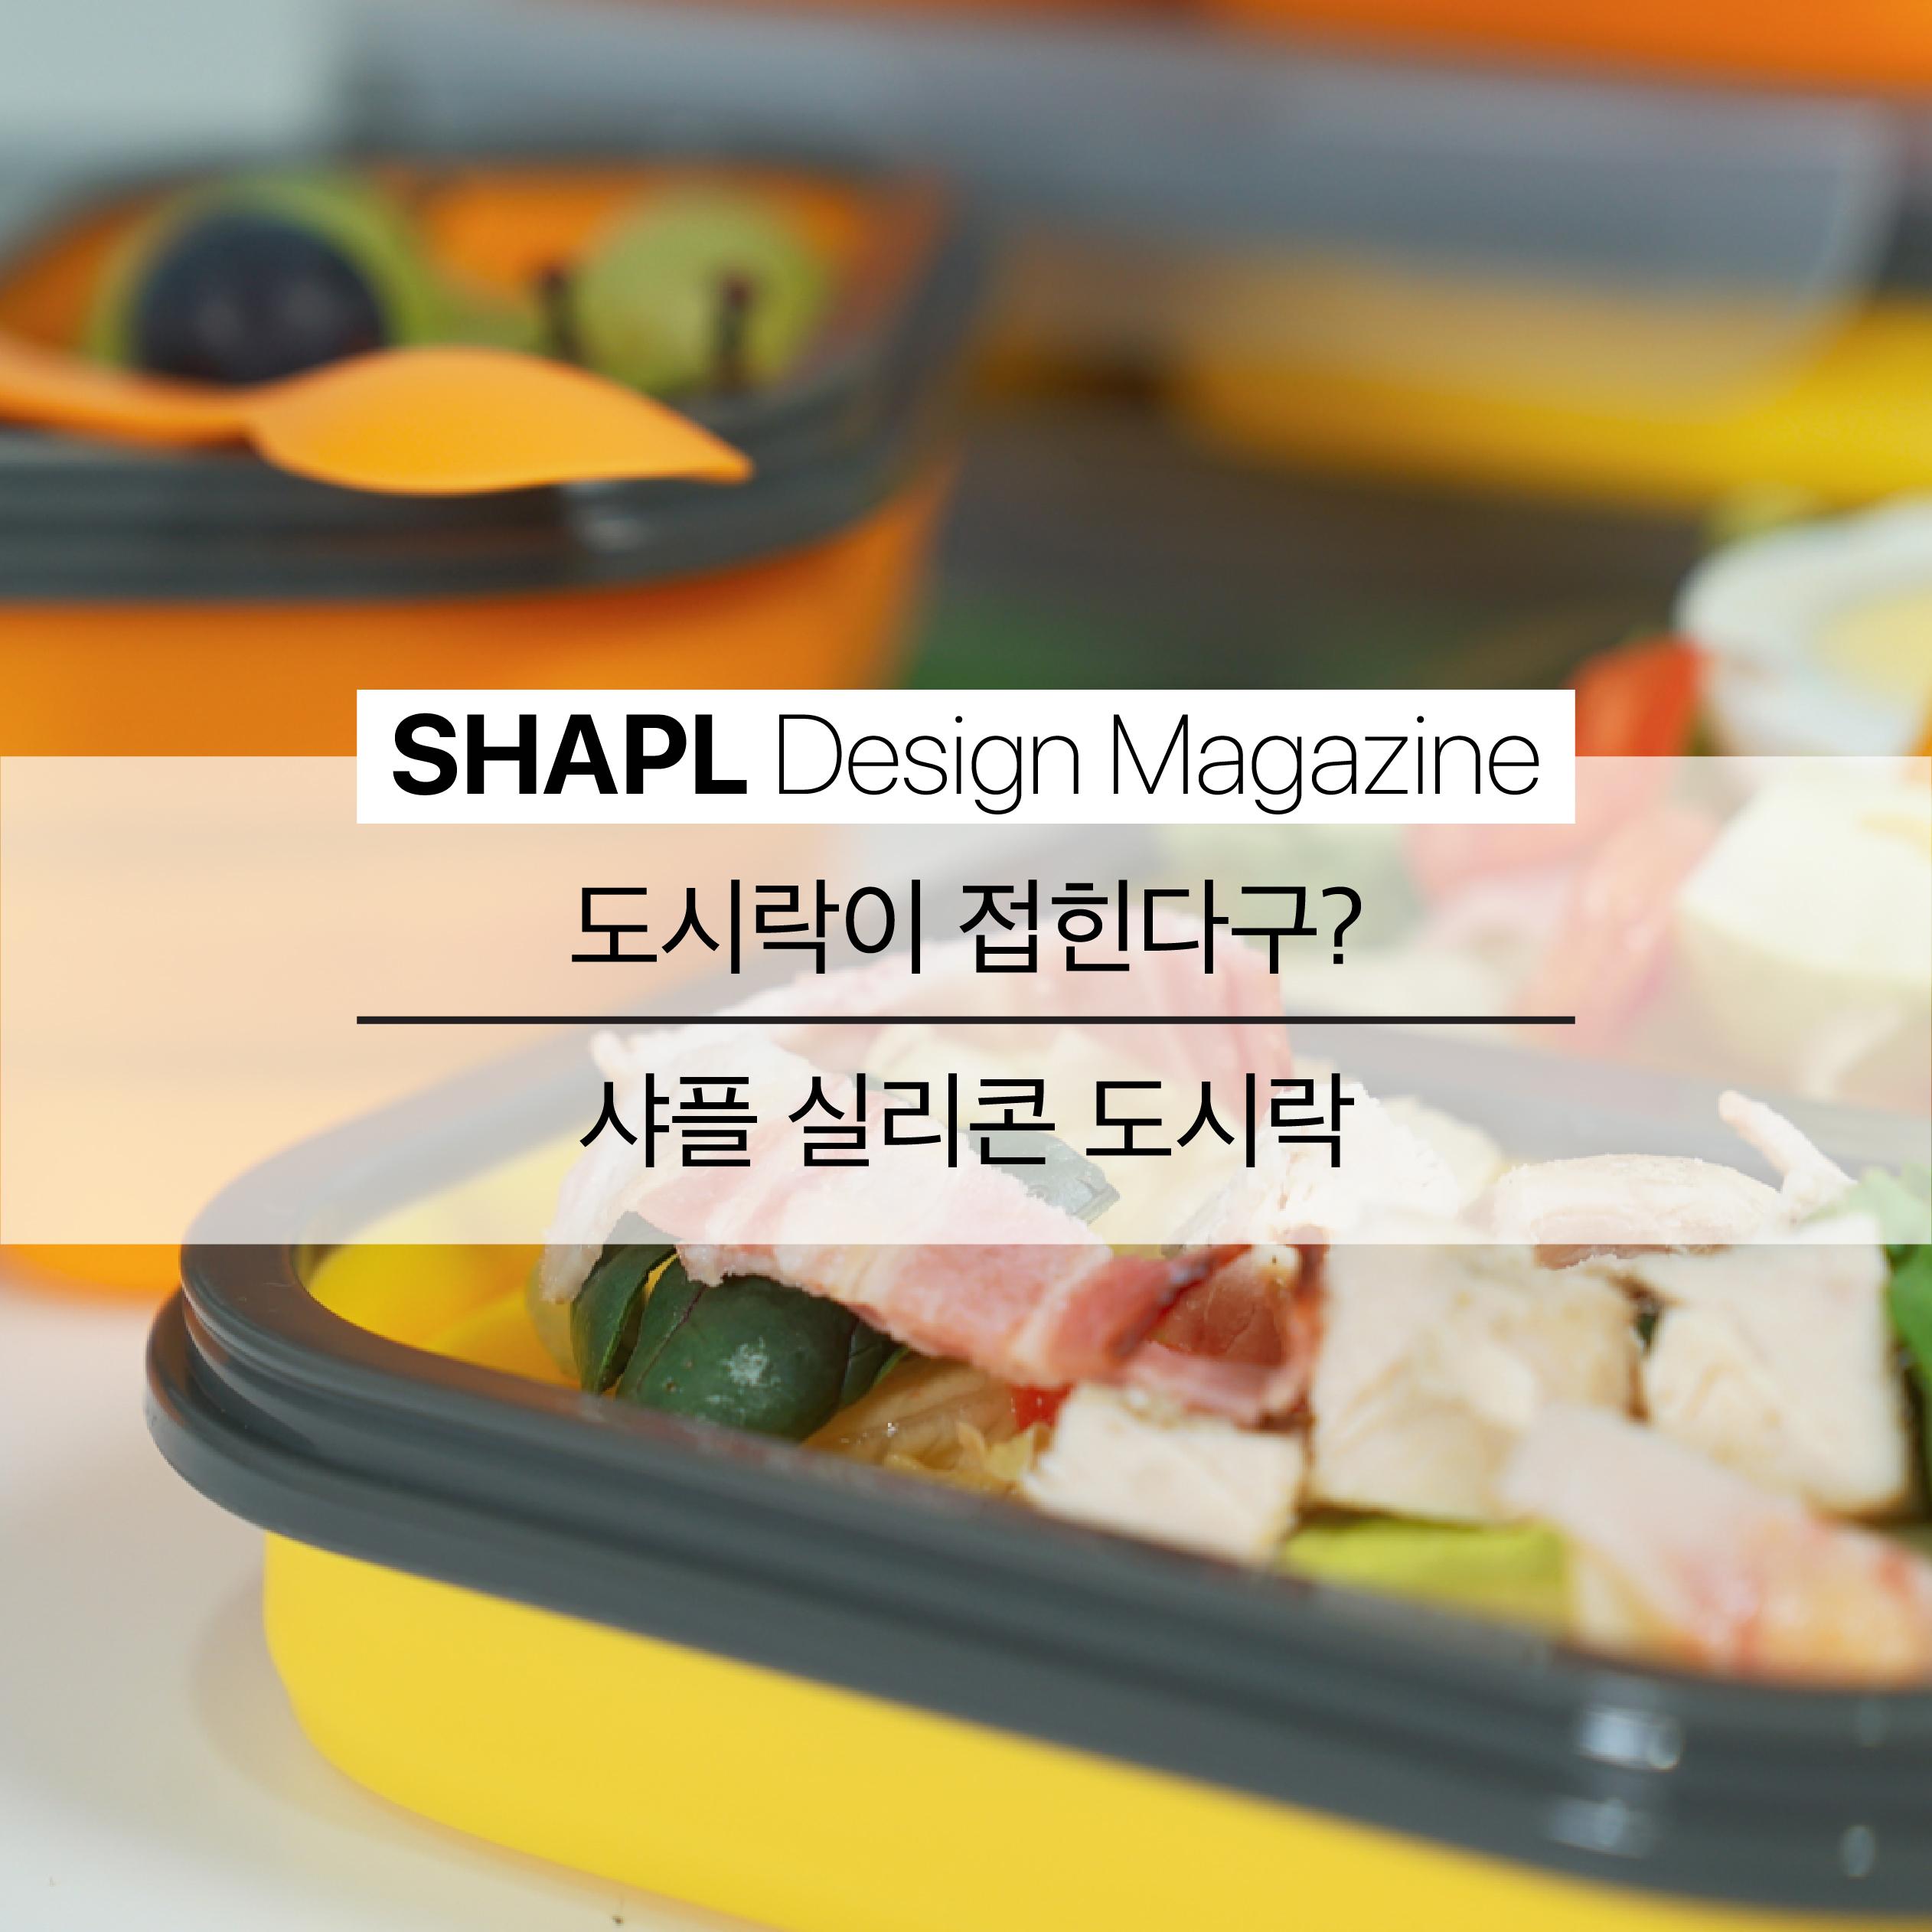 [SHAPL Design Magazine] 도시락이 접힌다구? 샤플 실리콘 도시락